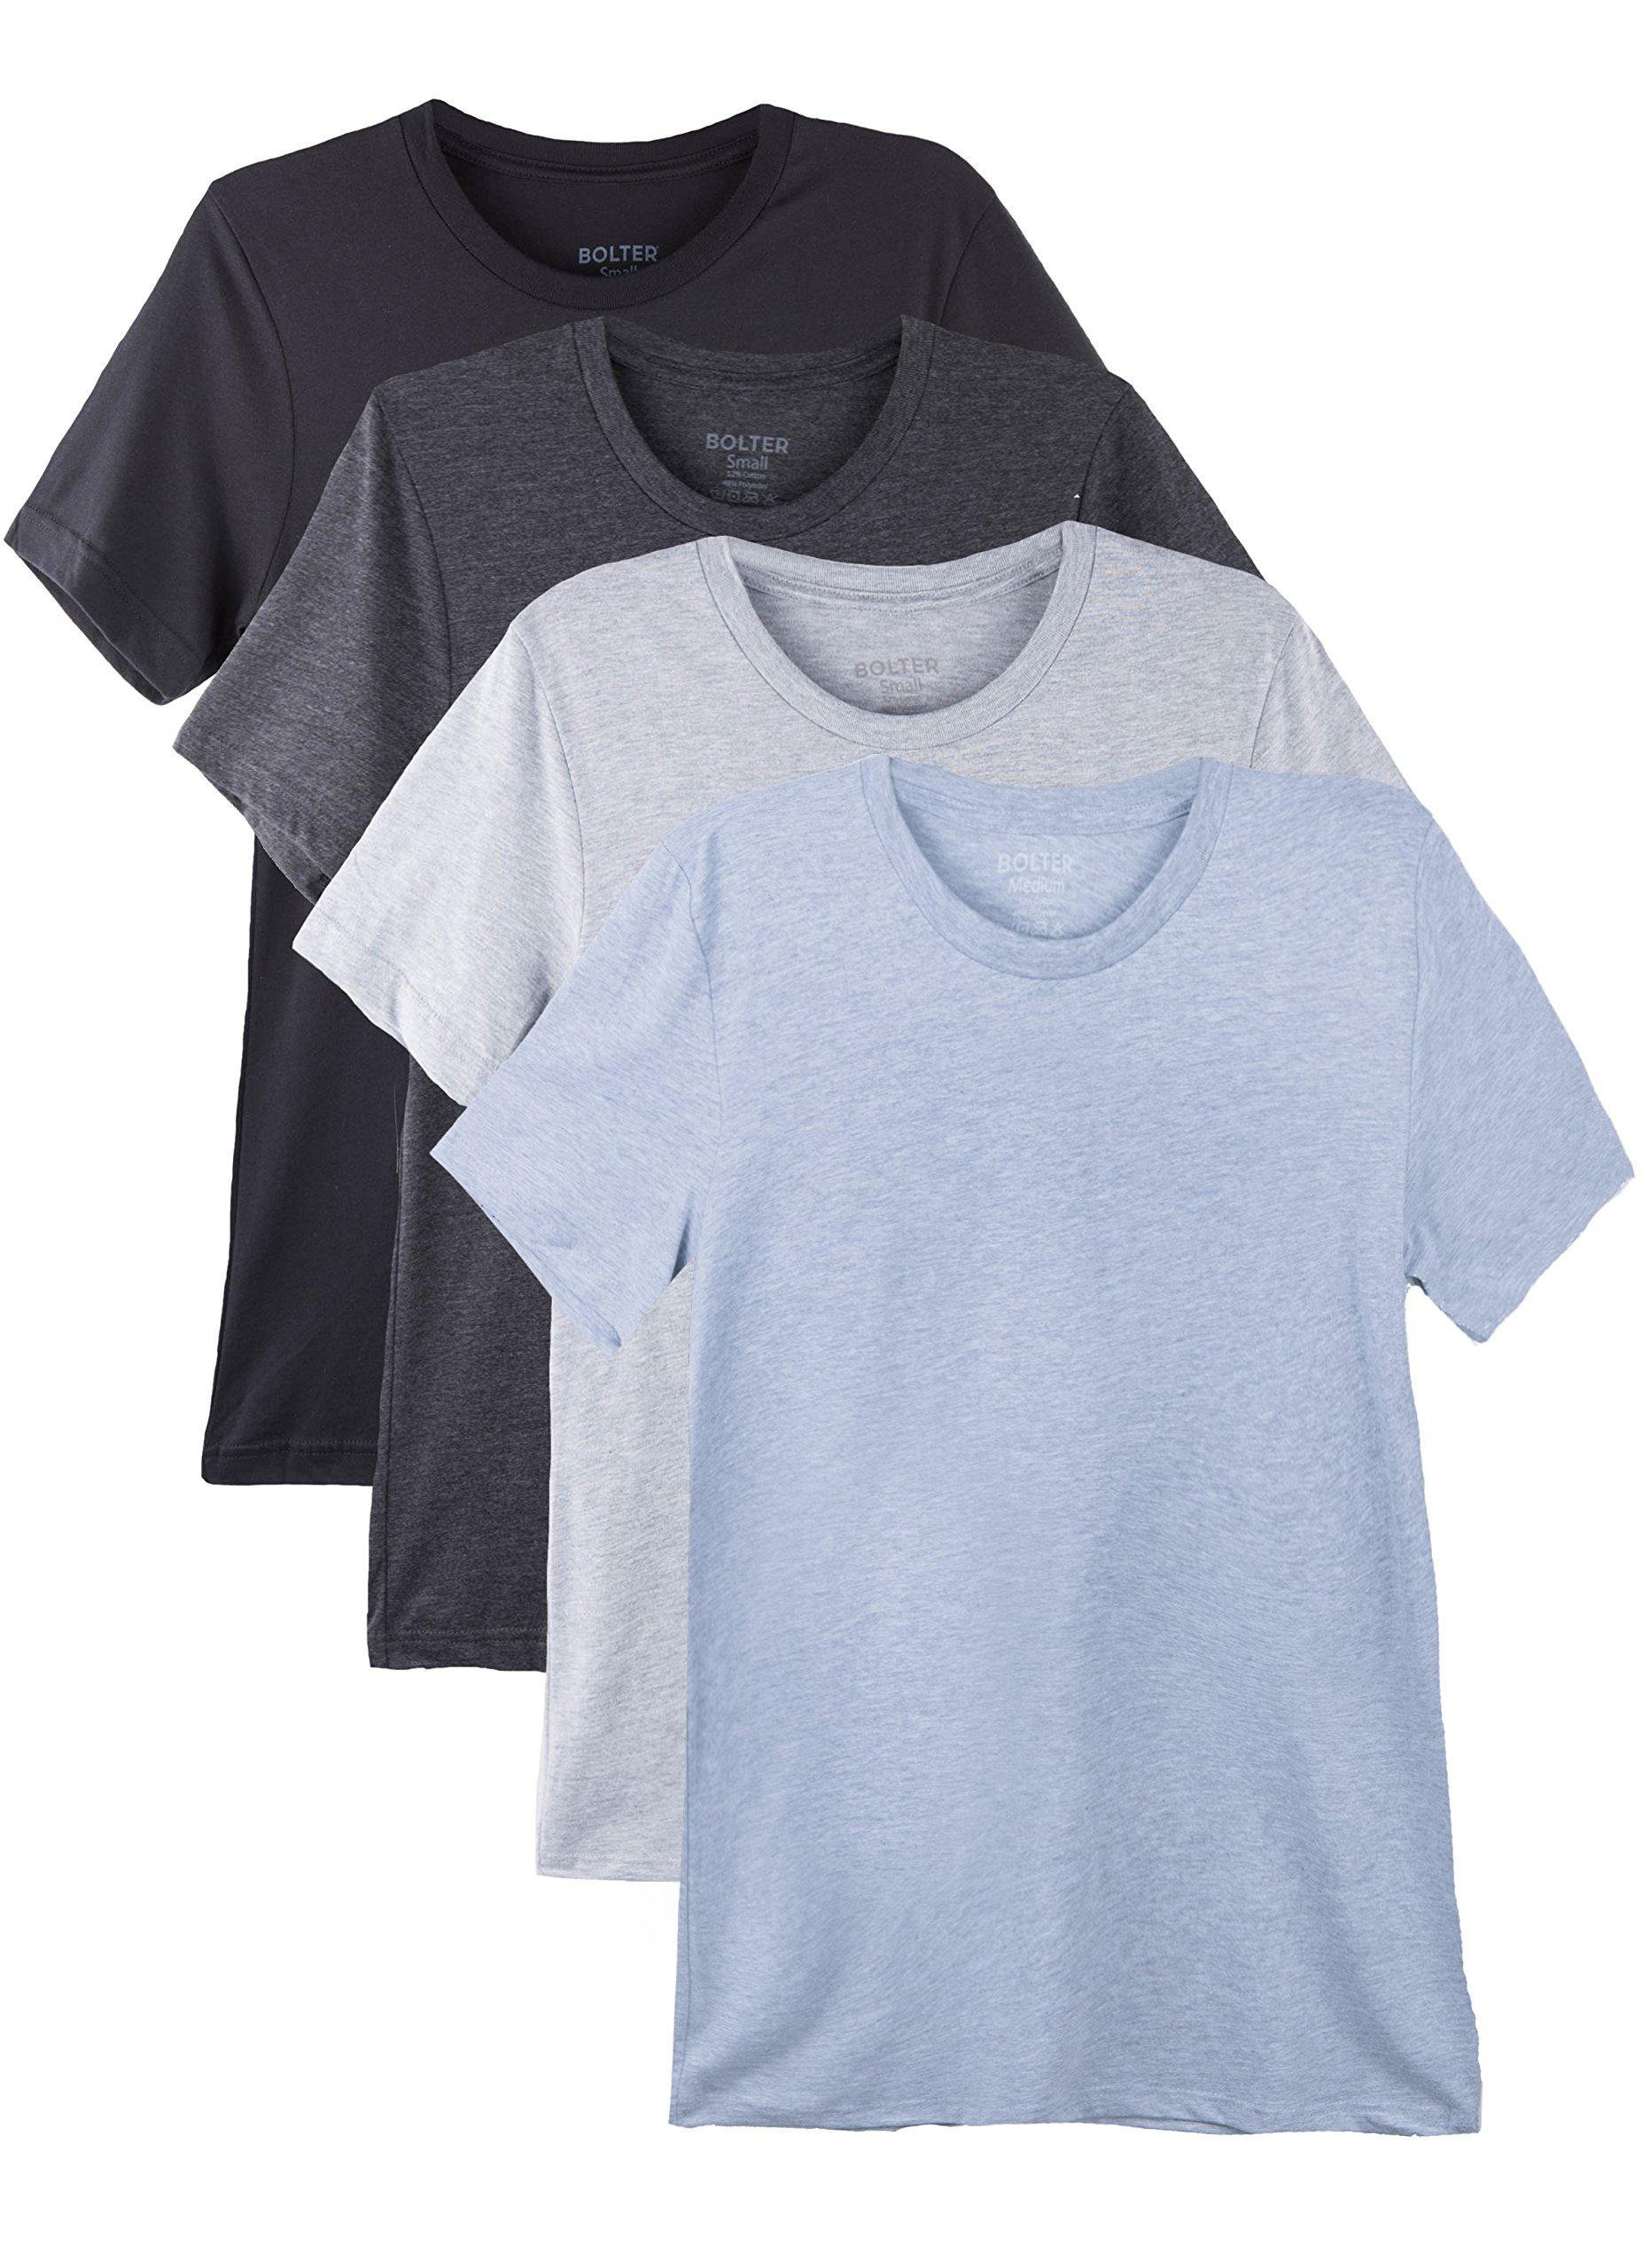 Bolter 4 Pack Men's Everyday Cotton Blend Short Sleeve T-Shirt (Medium, Blk/H.Greys) by Bolter